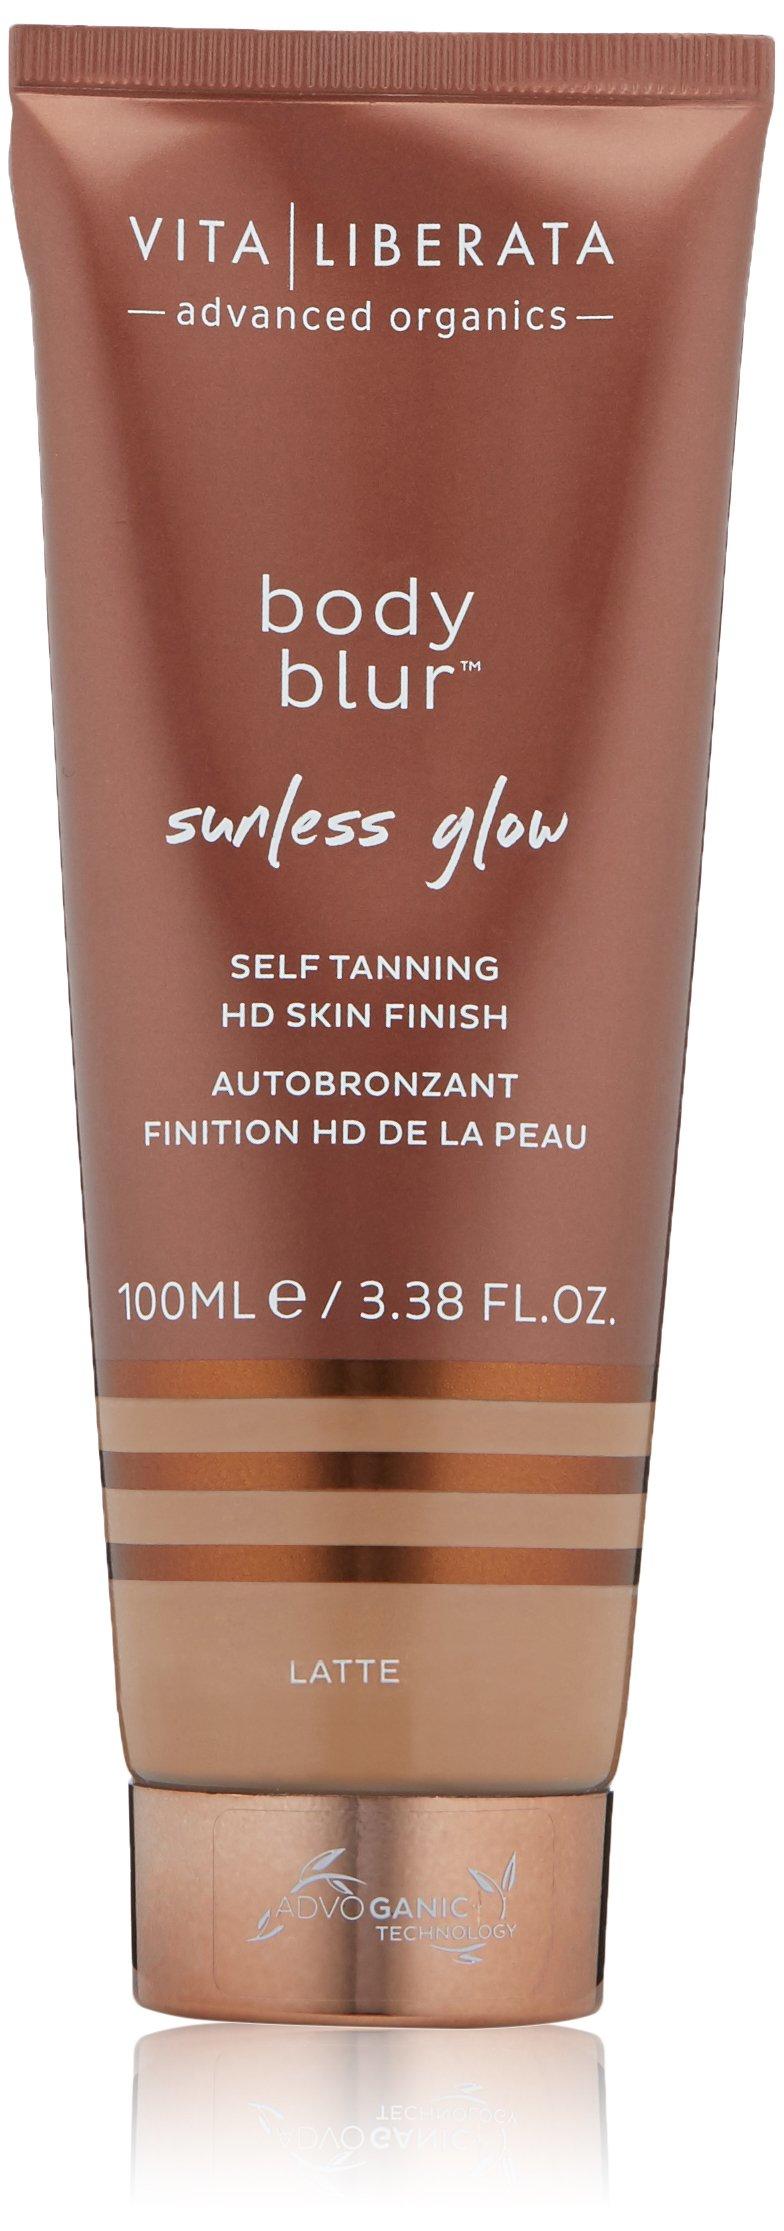 Vita Liberata Body Blur Sunless Glow Self Tanning HD Skin Finish, Latte, 3.38 Fl Oz